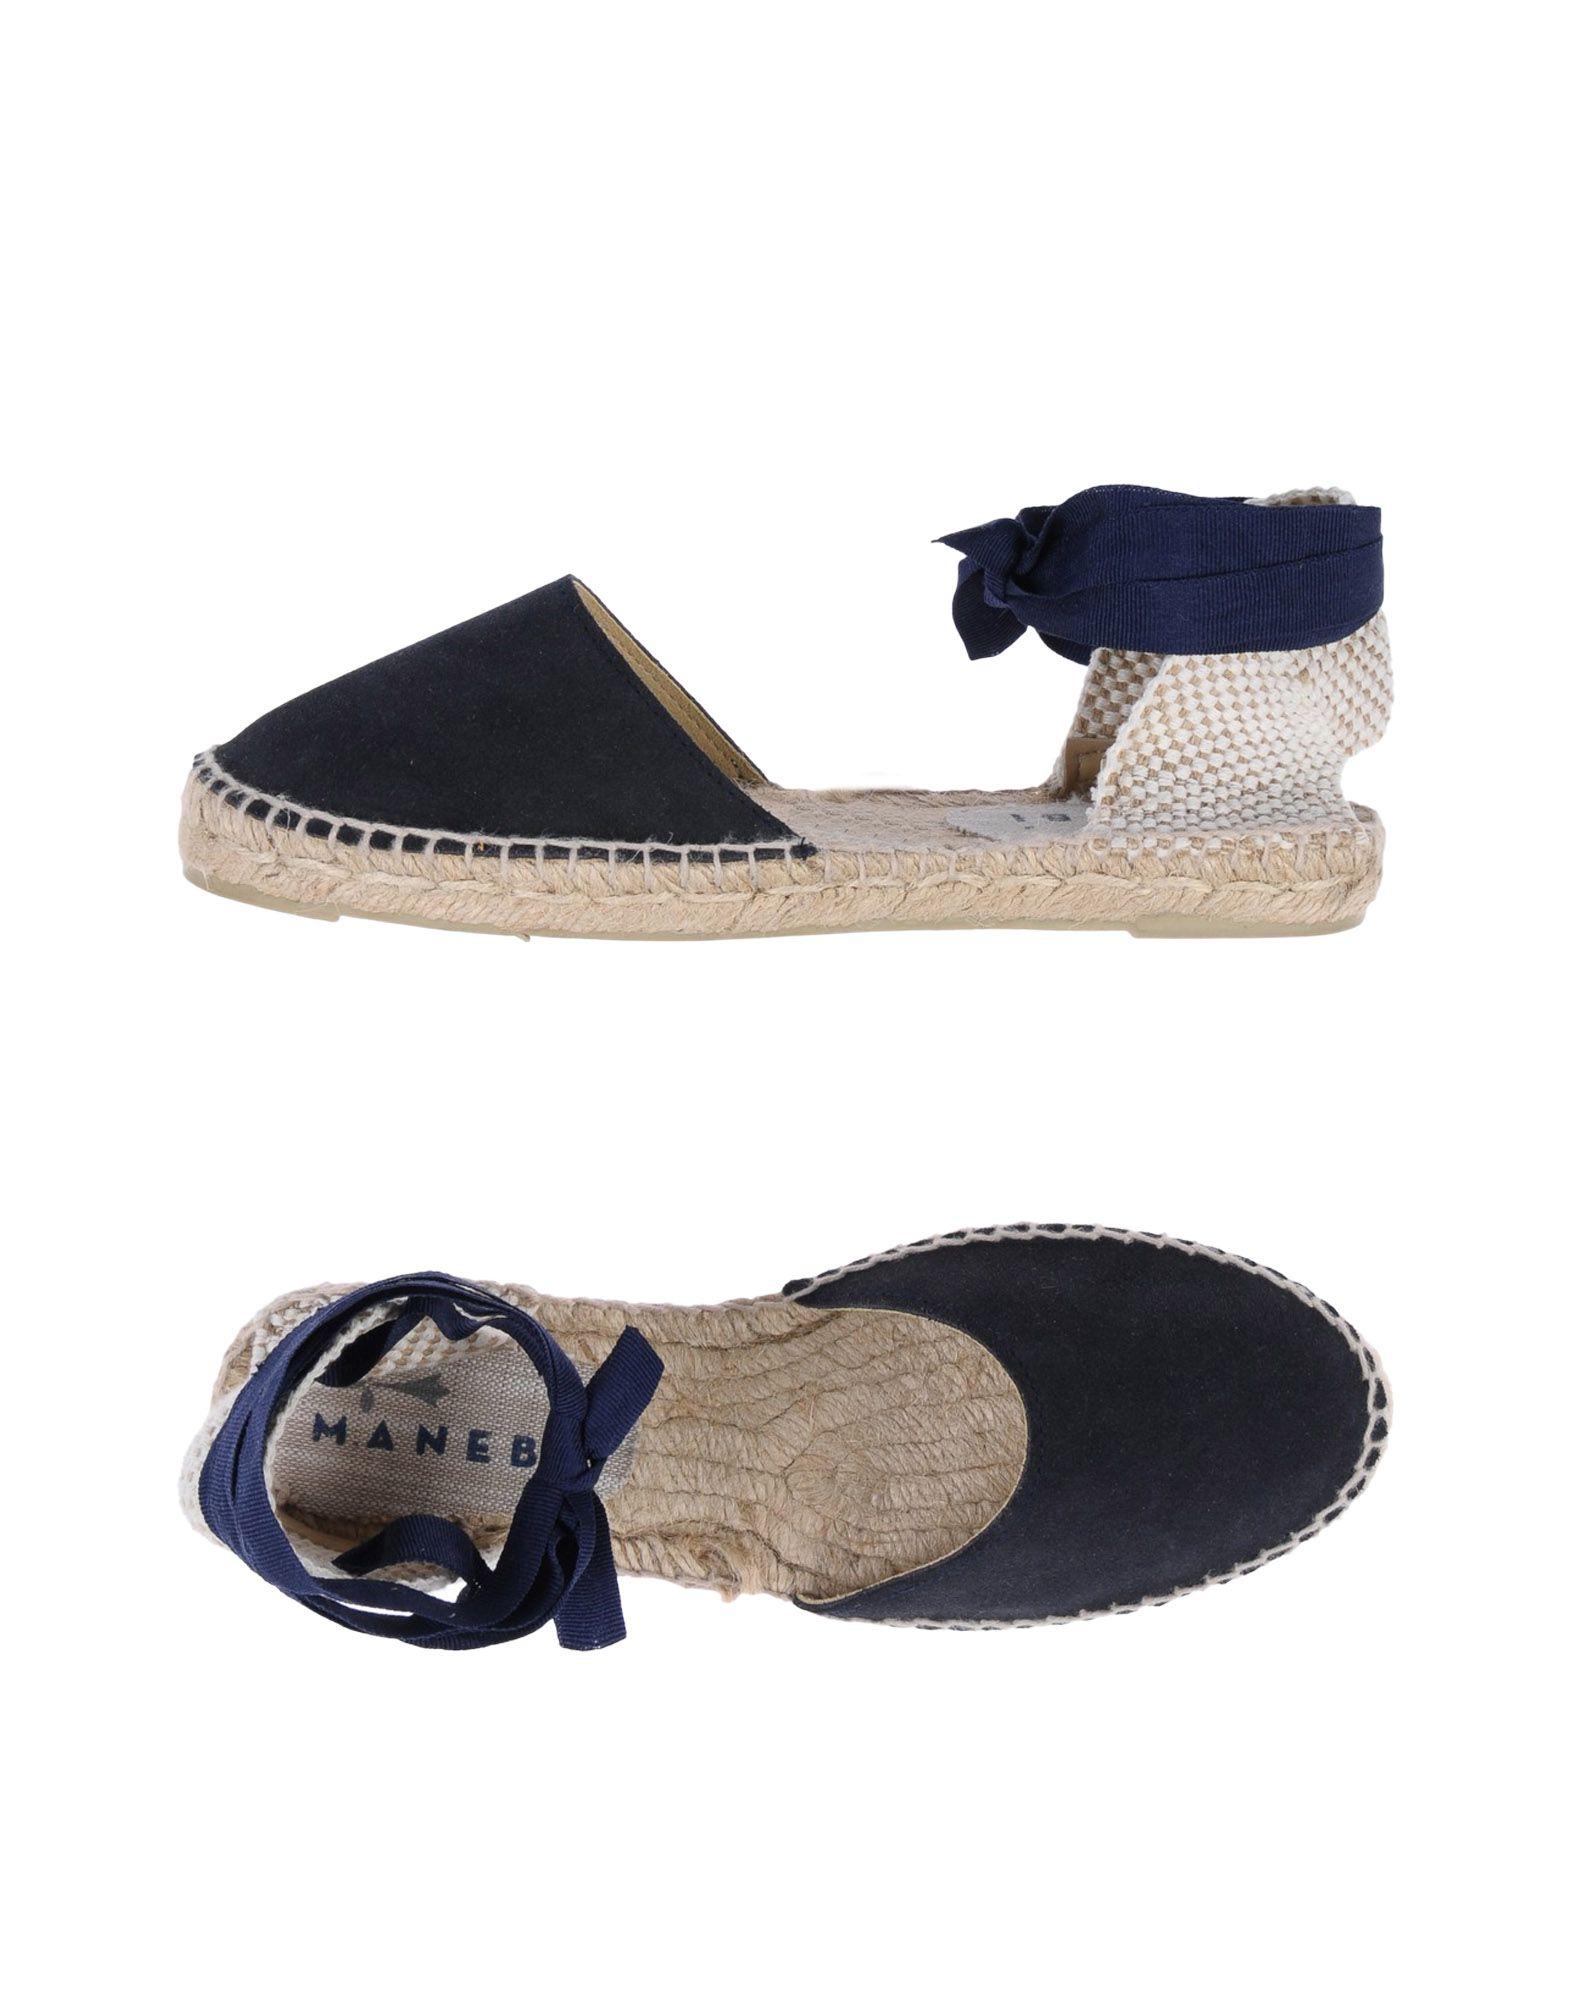 Manebí Espadrilles Espadrilles Manebí Damen  11413062RP Gute Qualität beliebte Schuhe e97396